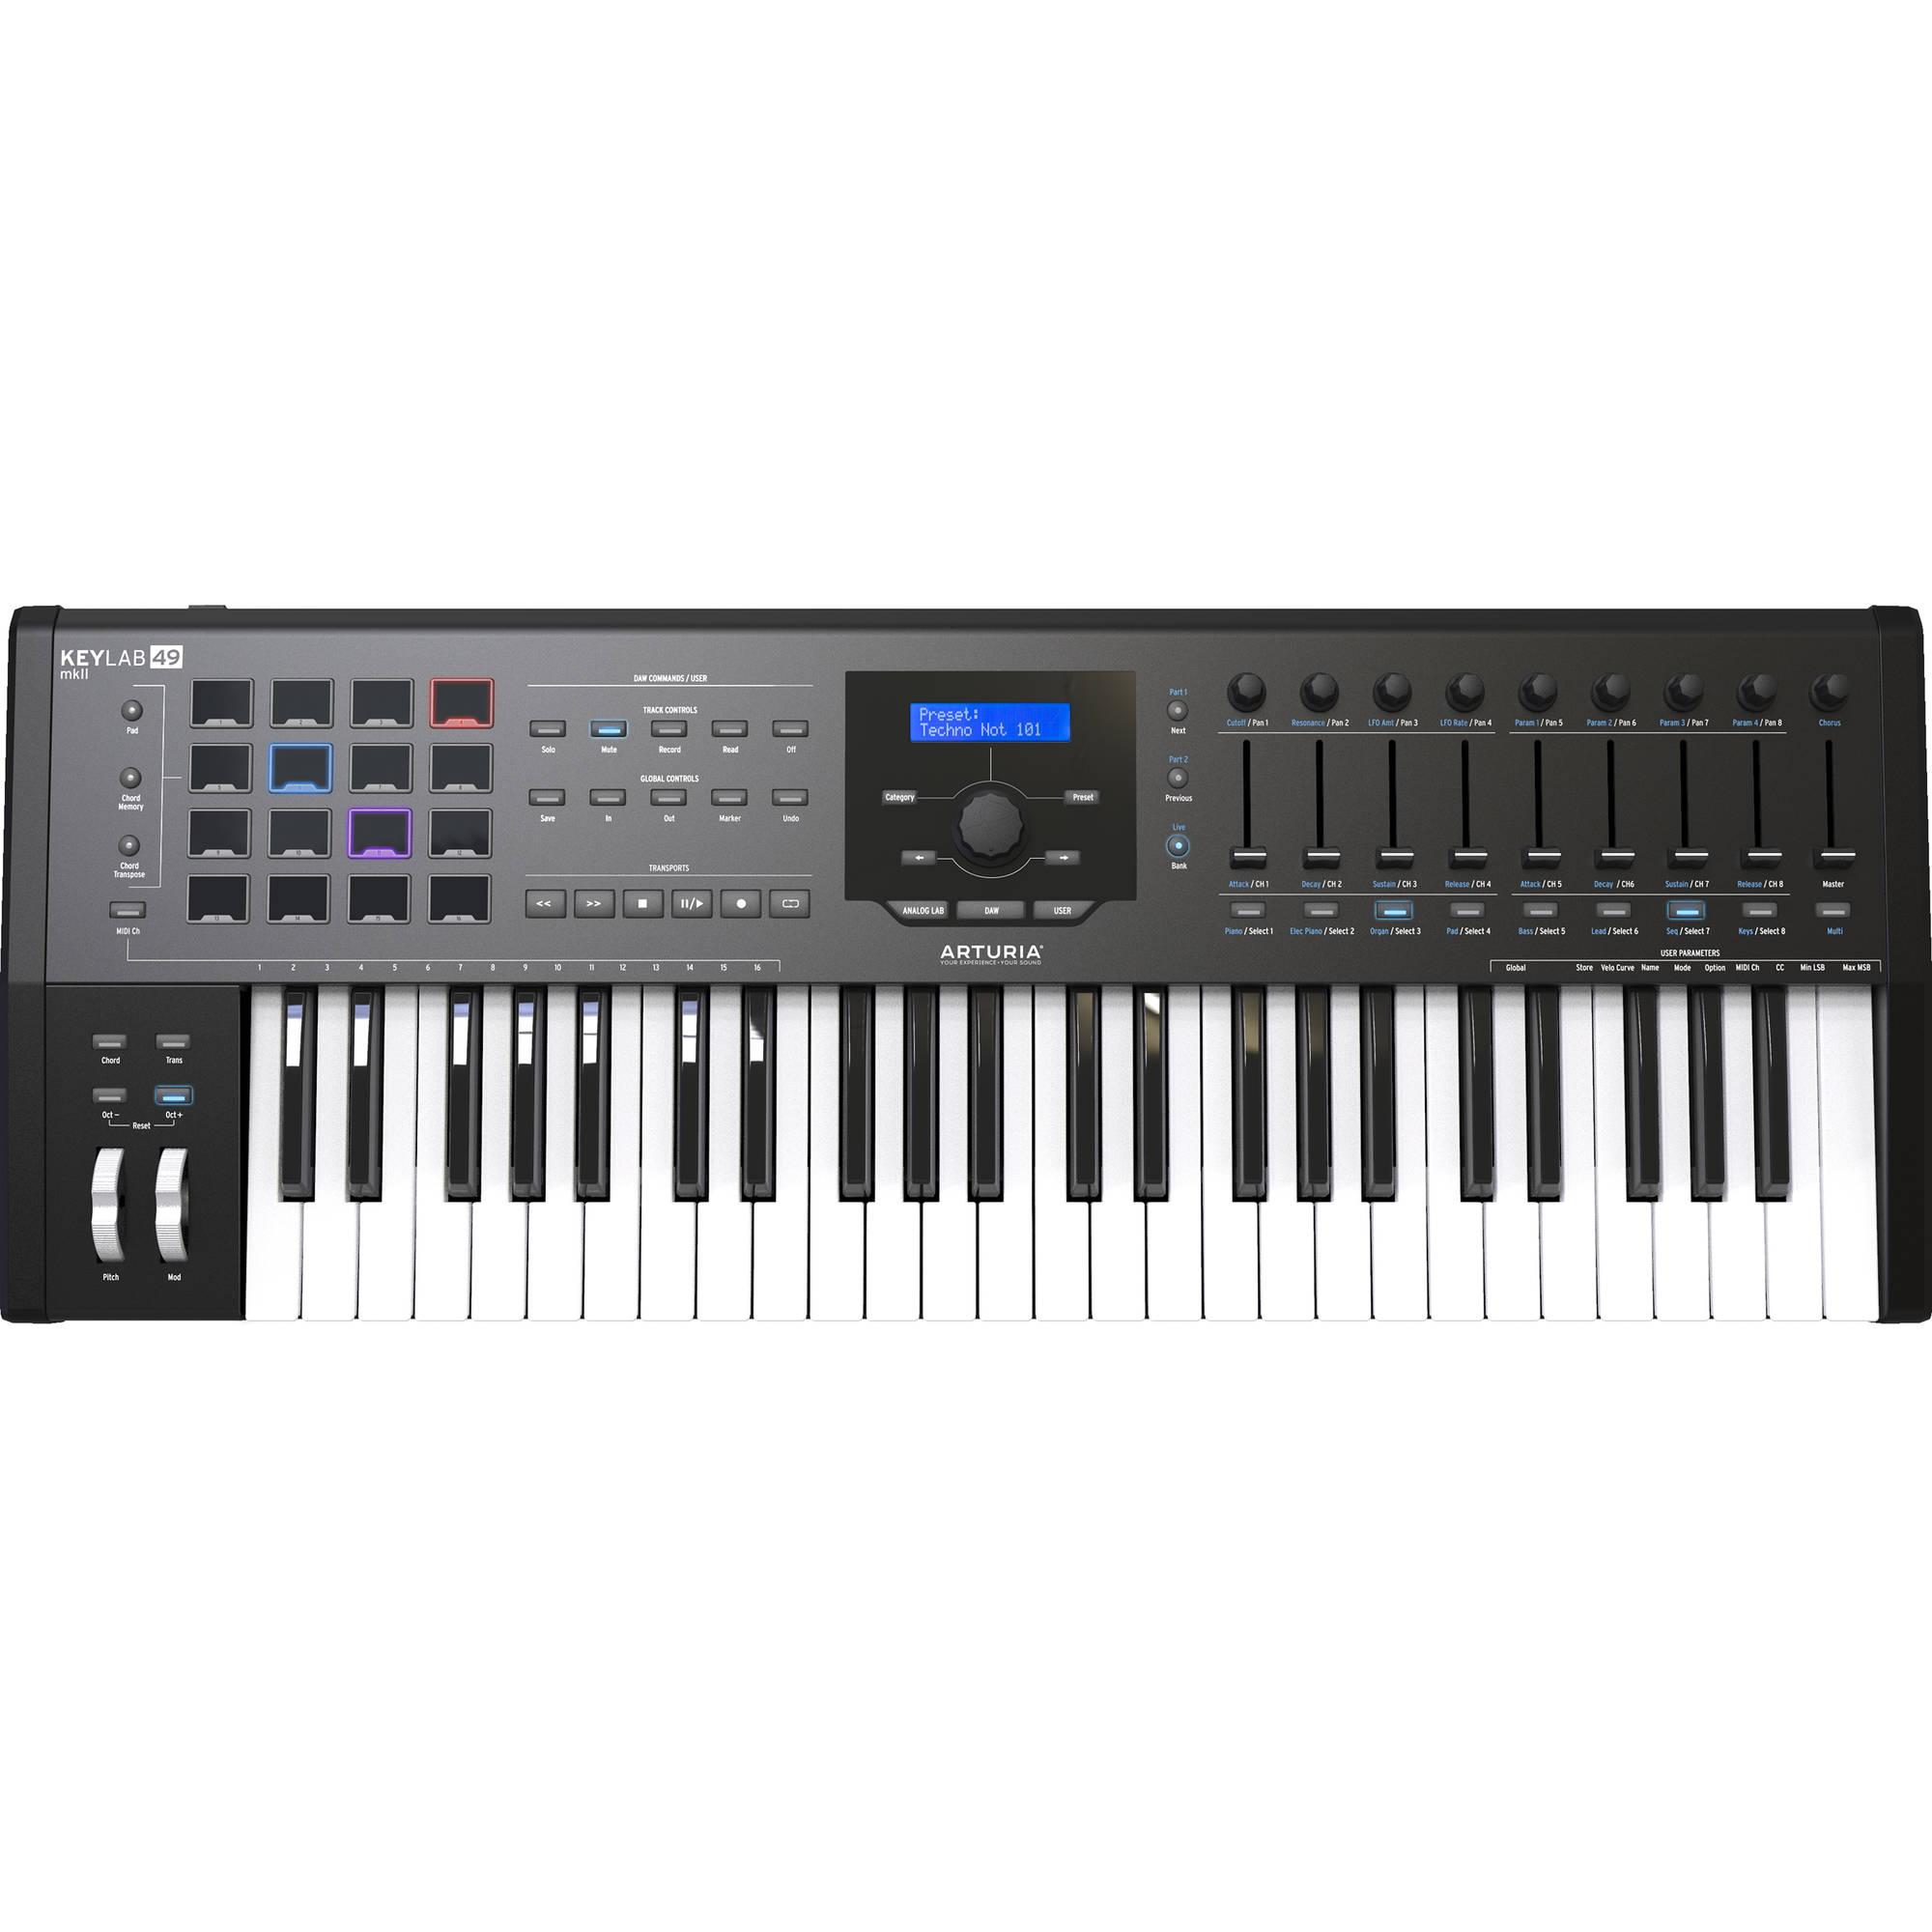 Arturia KeyLab MKII 49 - Professional MIDI Controller and Software (Black)